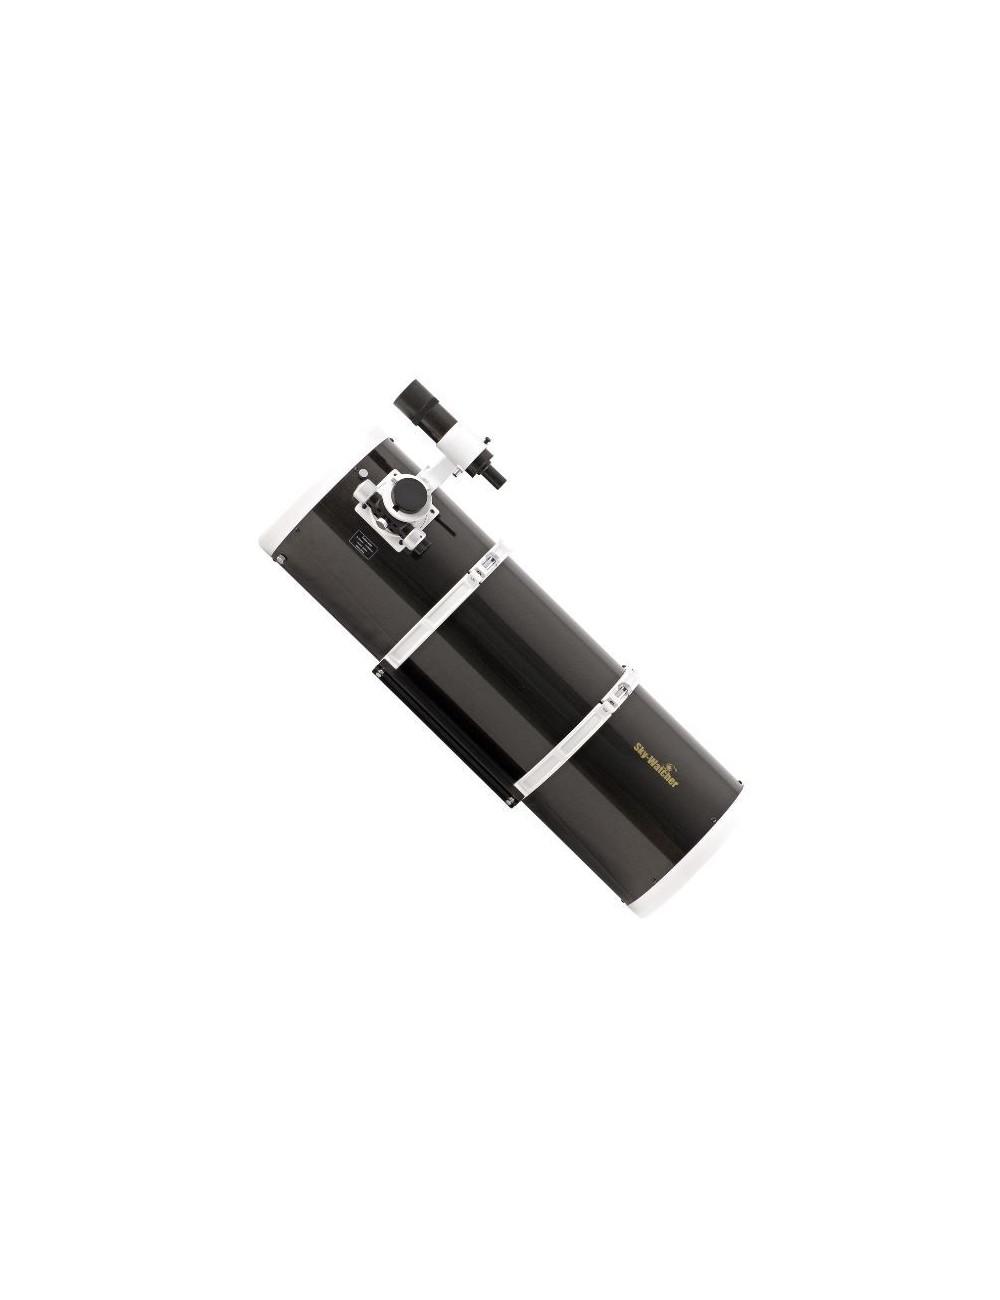 Tube optique Newton 250/1000 Sky-Watcher Black Diamond Dual Speed